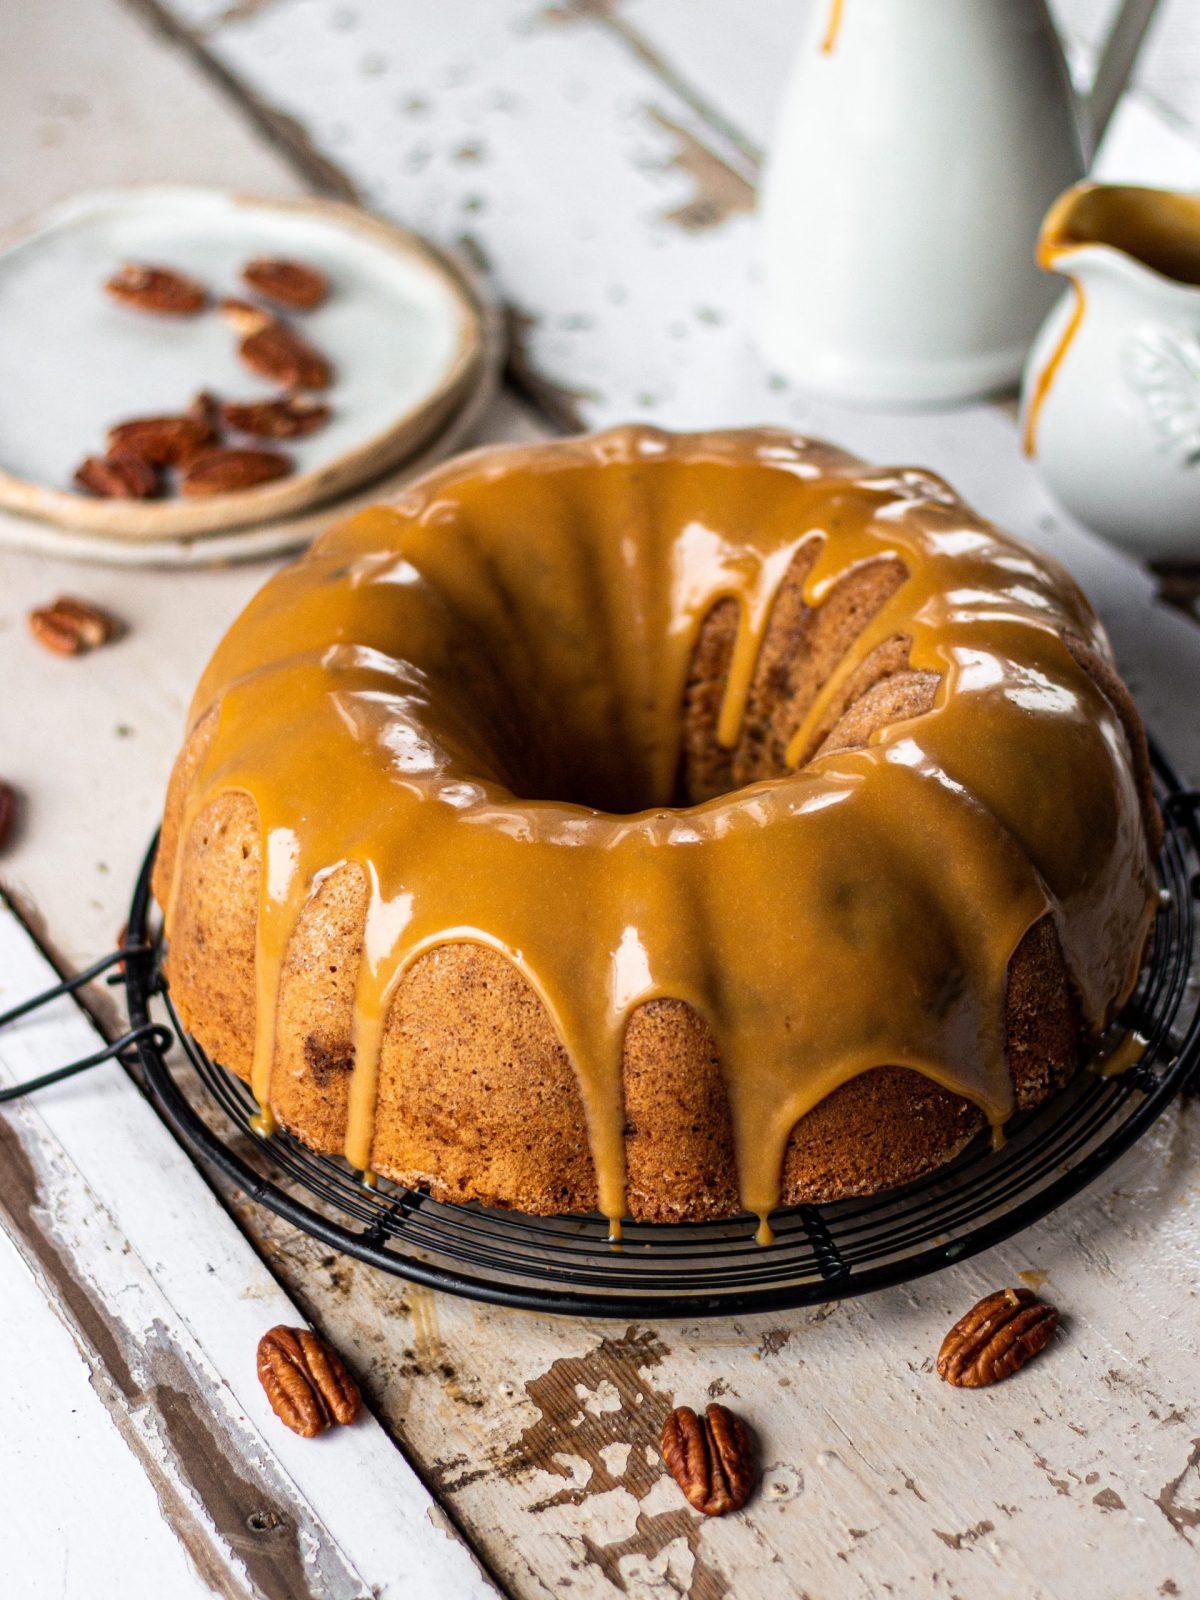 Improving your baking skills